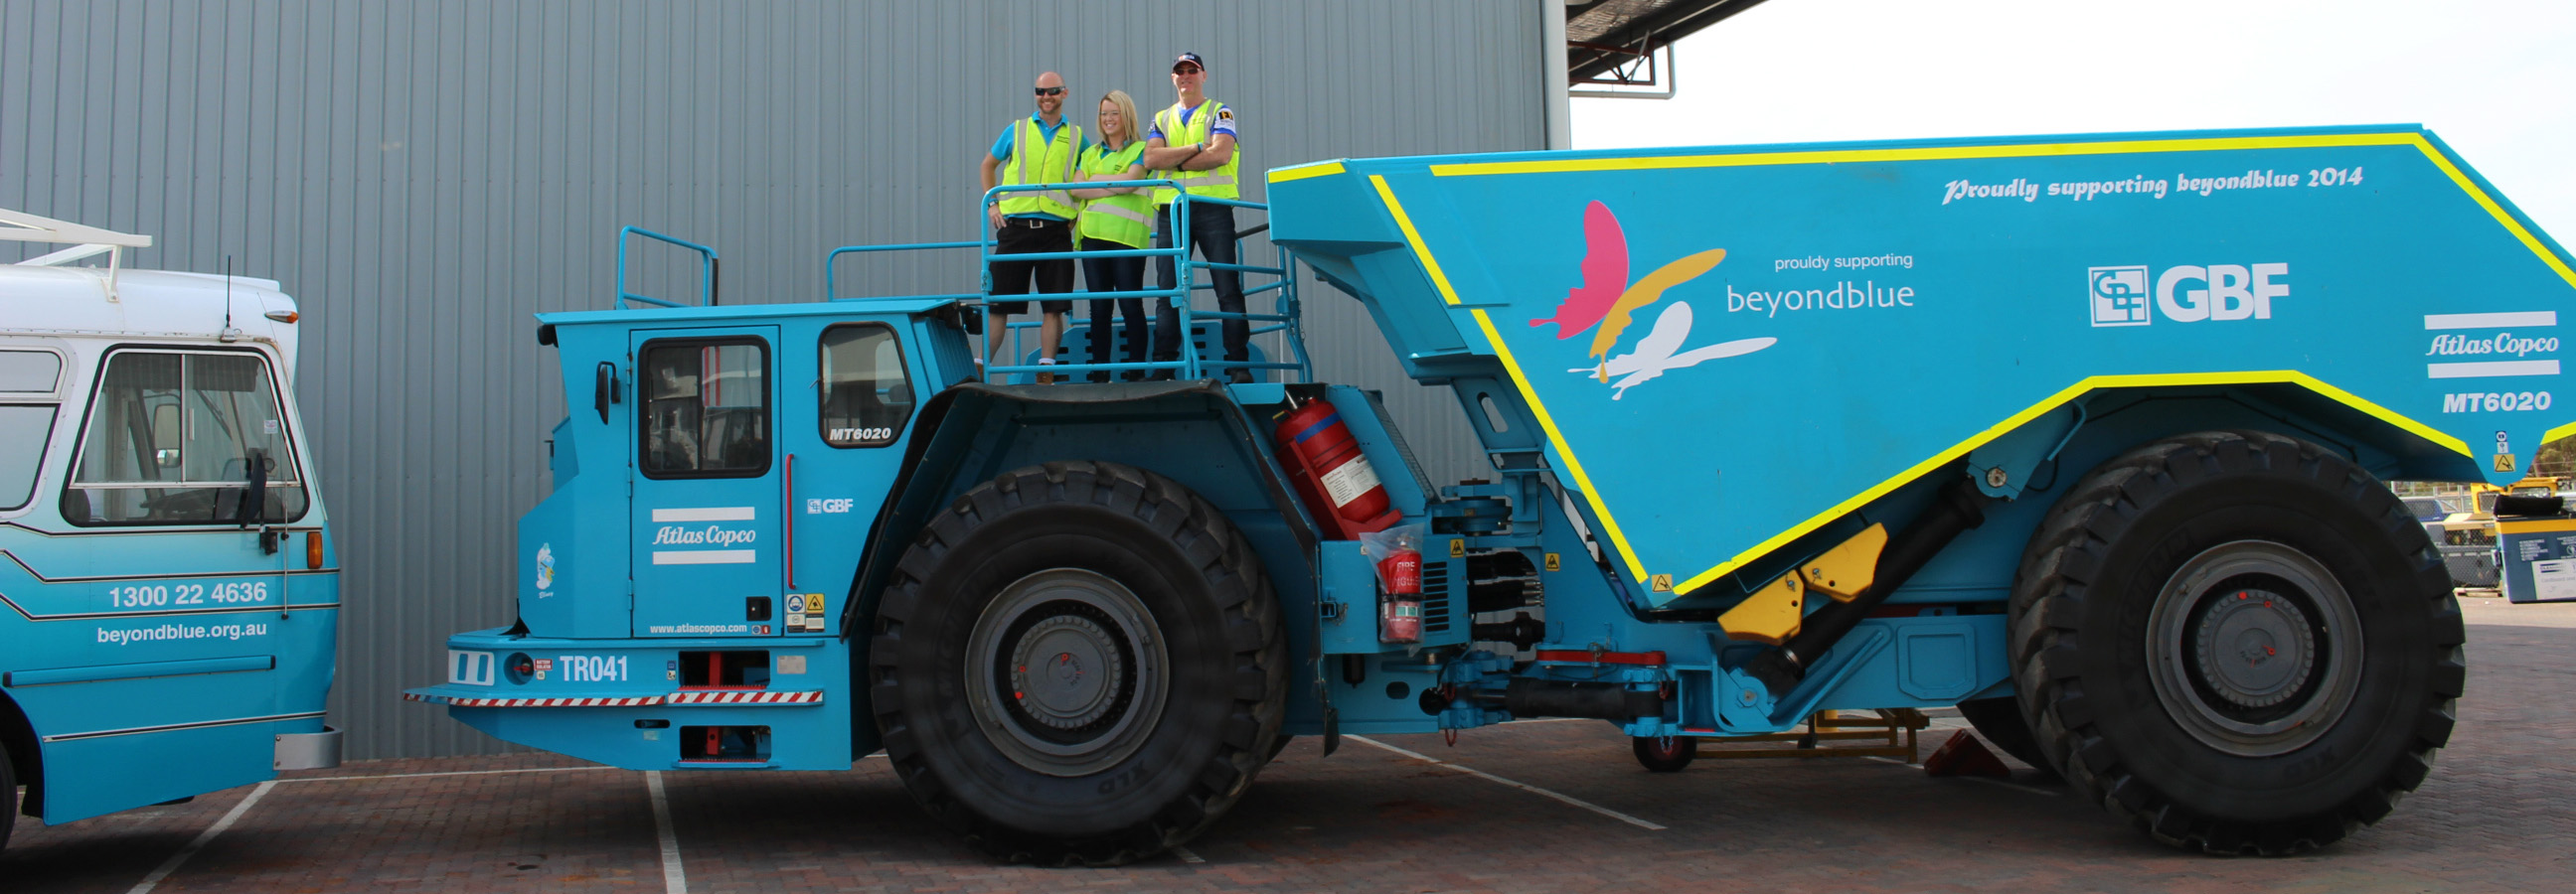 Roadshow Rhonda met GBF Underground Mining's Papa Smurf in Kalgoorlie: WA.